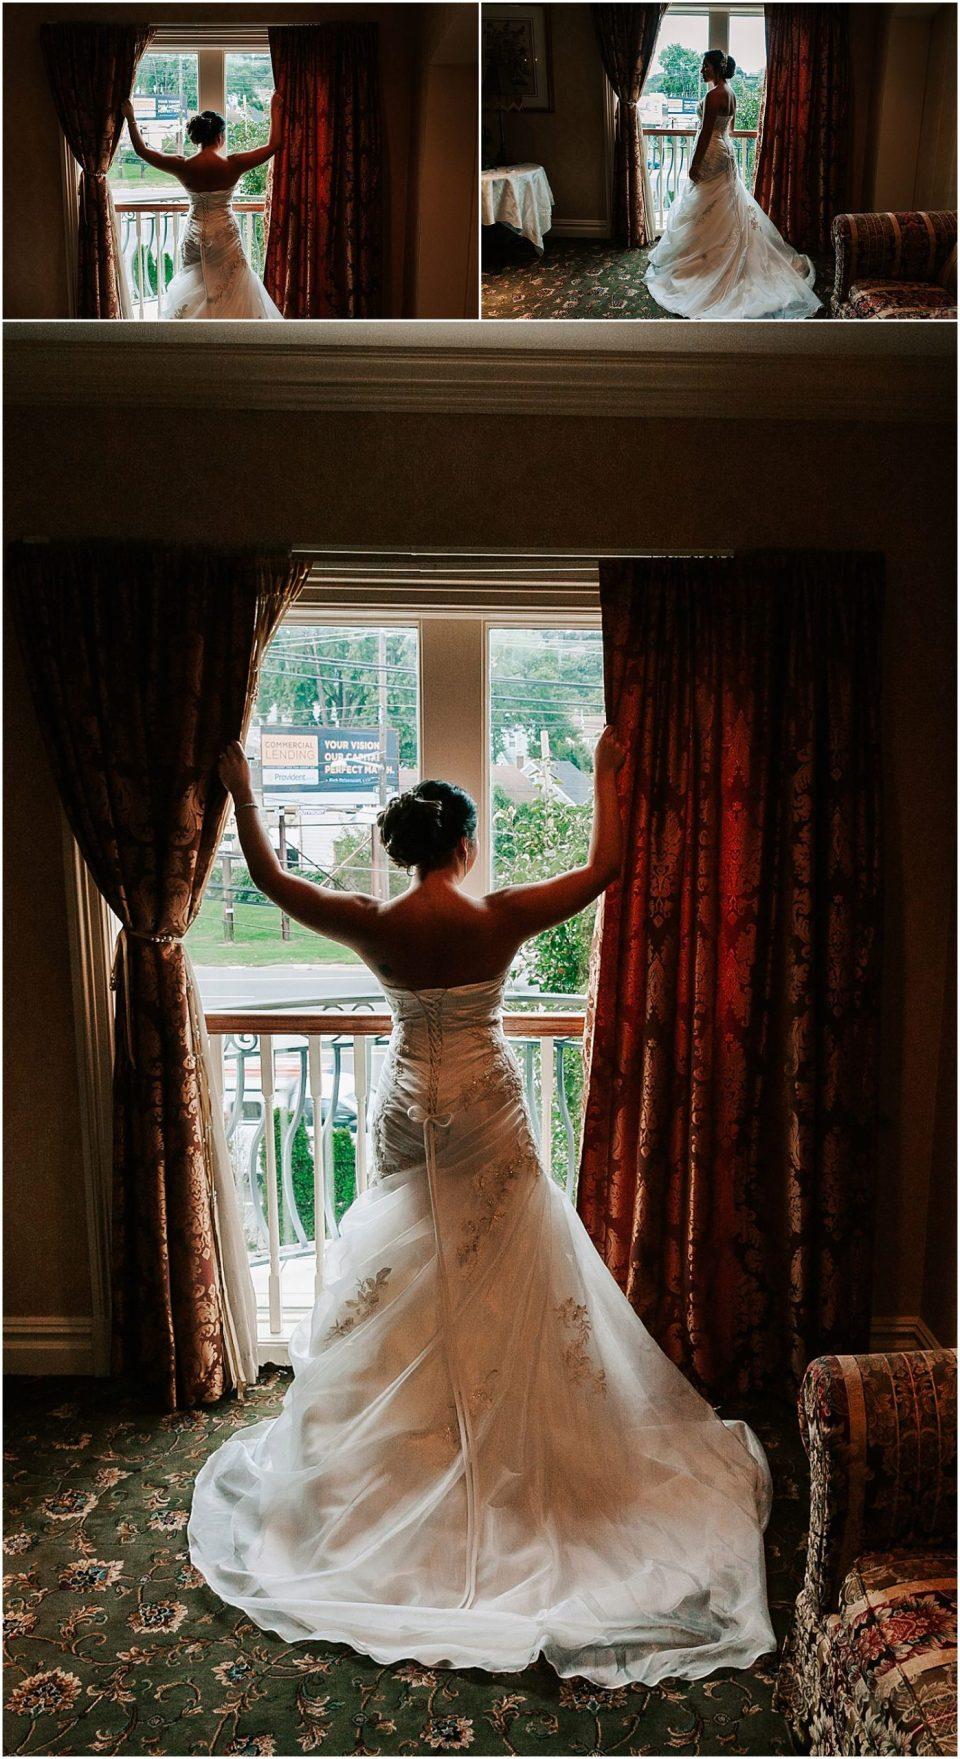 Bridal portraits at this Il Villagio wedding venue